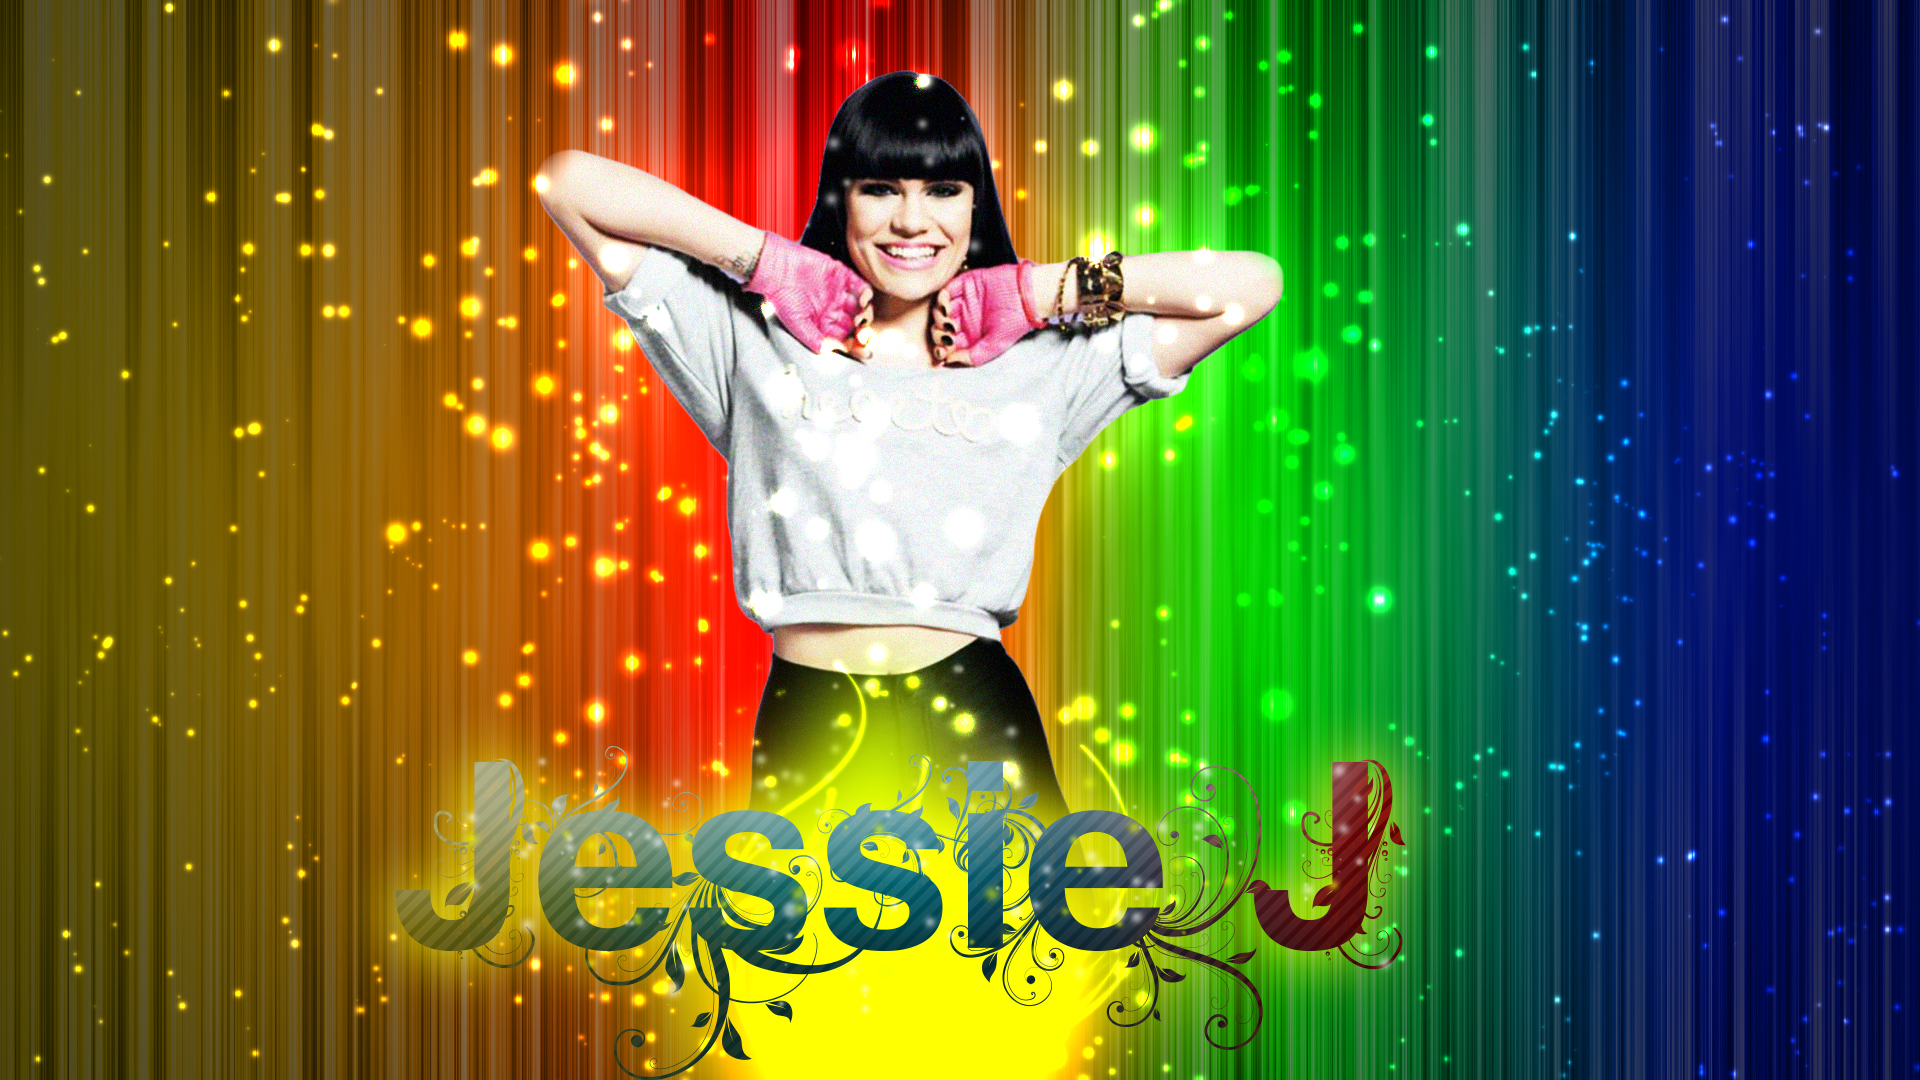 jessie j 2012 wallpaper